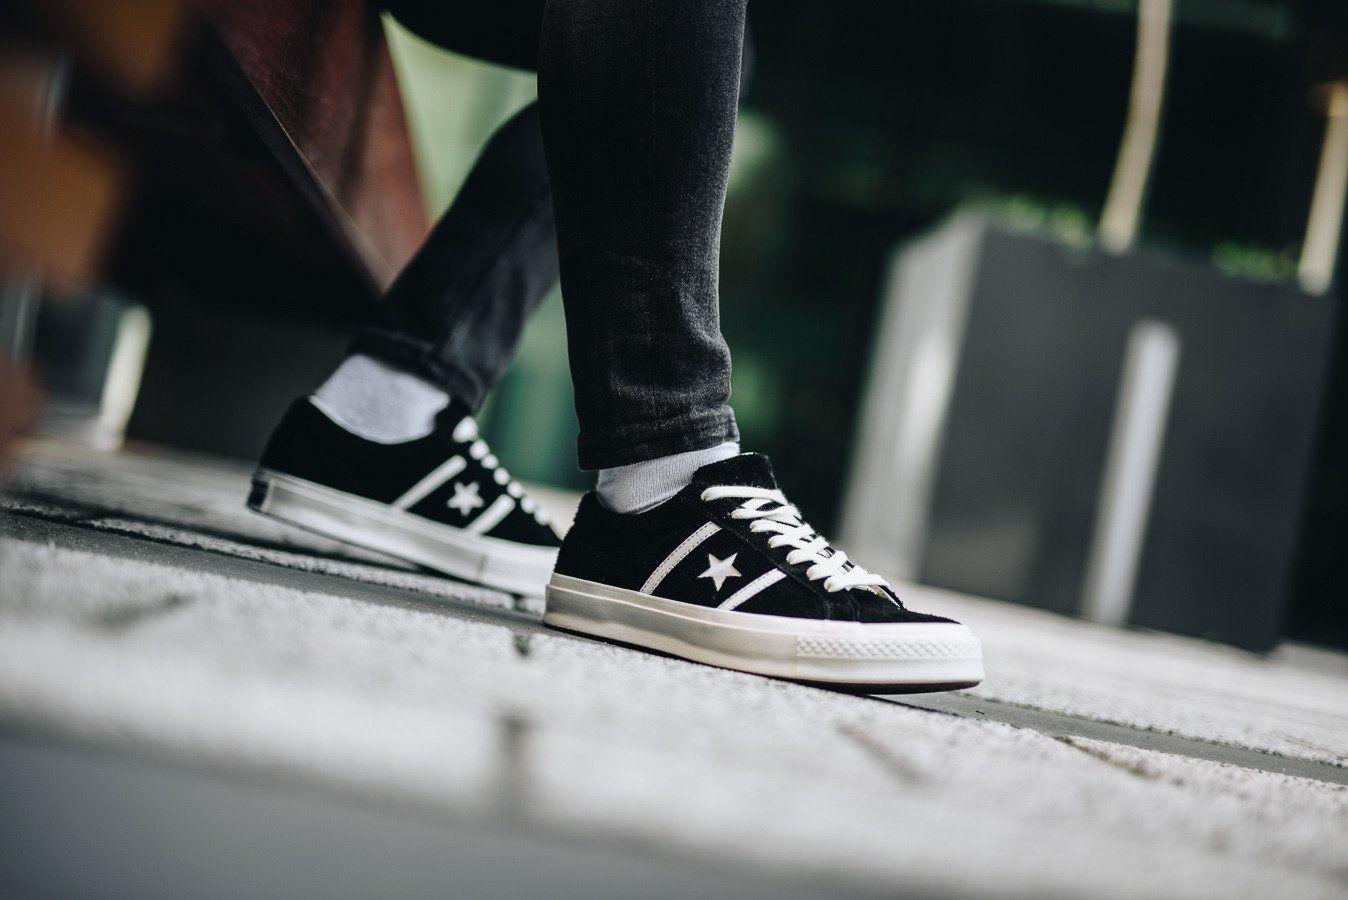 Elegant Converse One Star Pro Cf Wildleder Mid Schuhe Herren